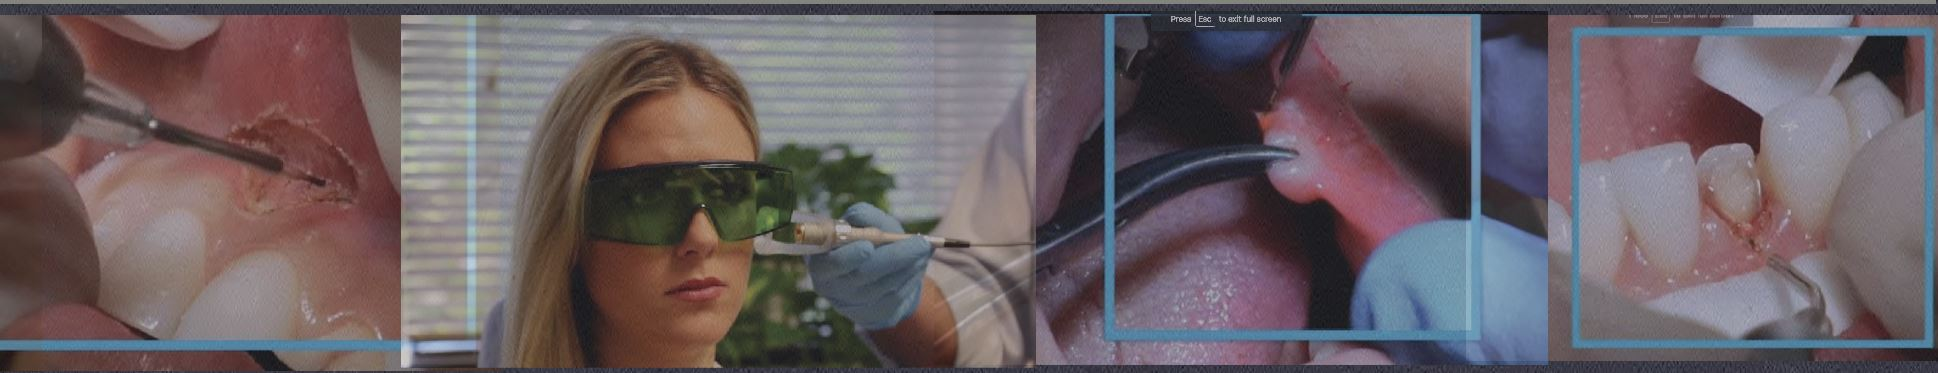 Incorporating Dental Laser in Your Practice. The Basic Workshop. Banner Image